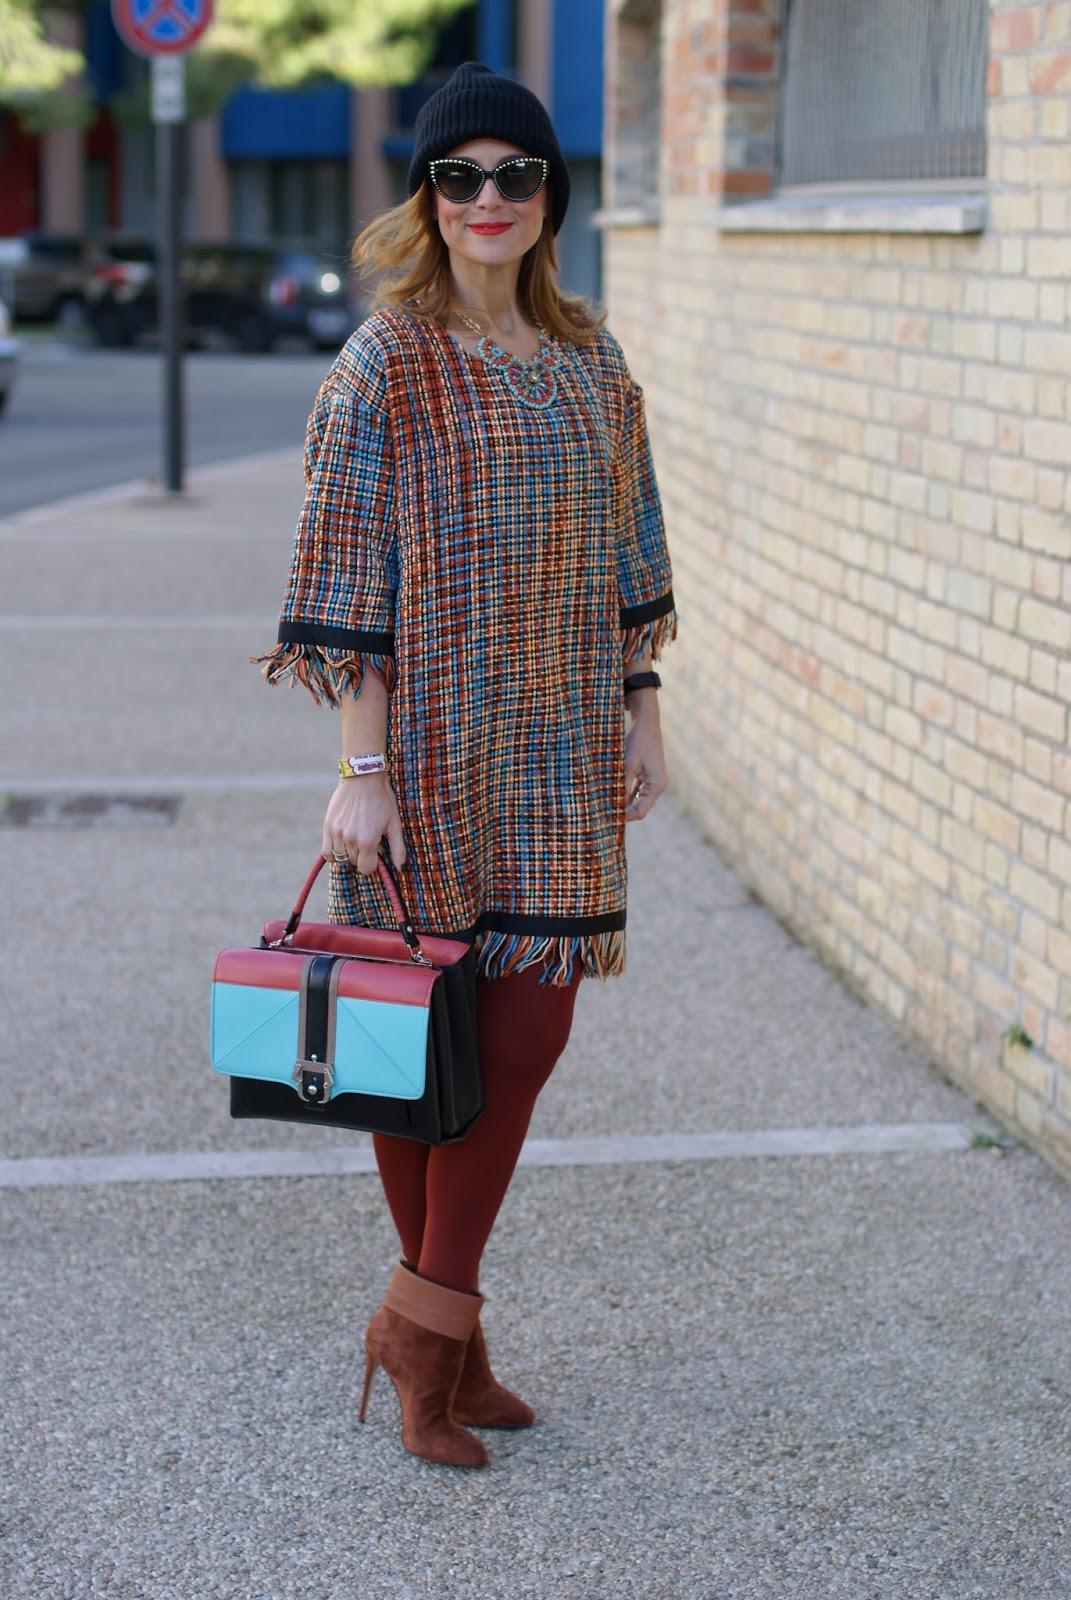 Vogos Gigi dress, Le Silla ankle boots and Paula Cademartori Faye bag on Fashion and Cookies fashion blog, fashion blogger style